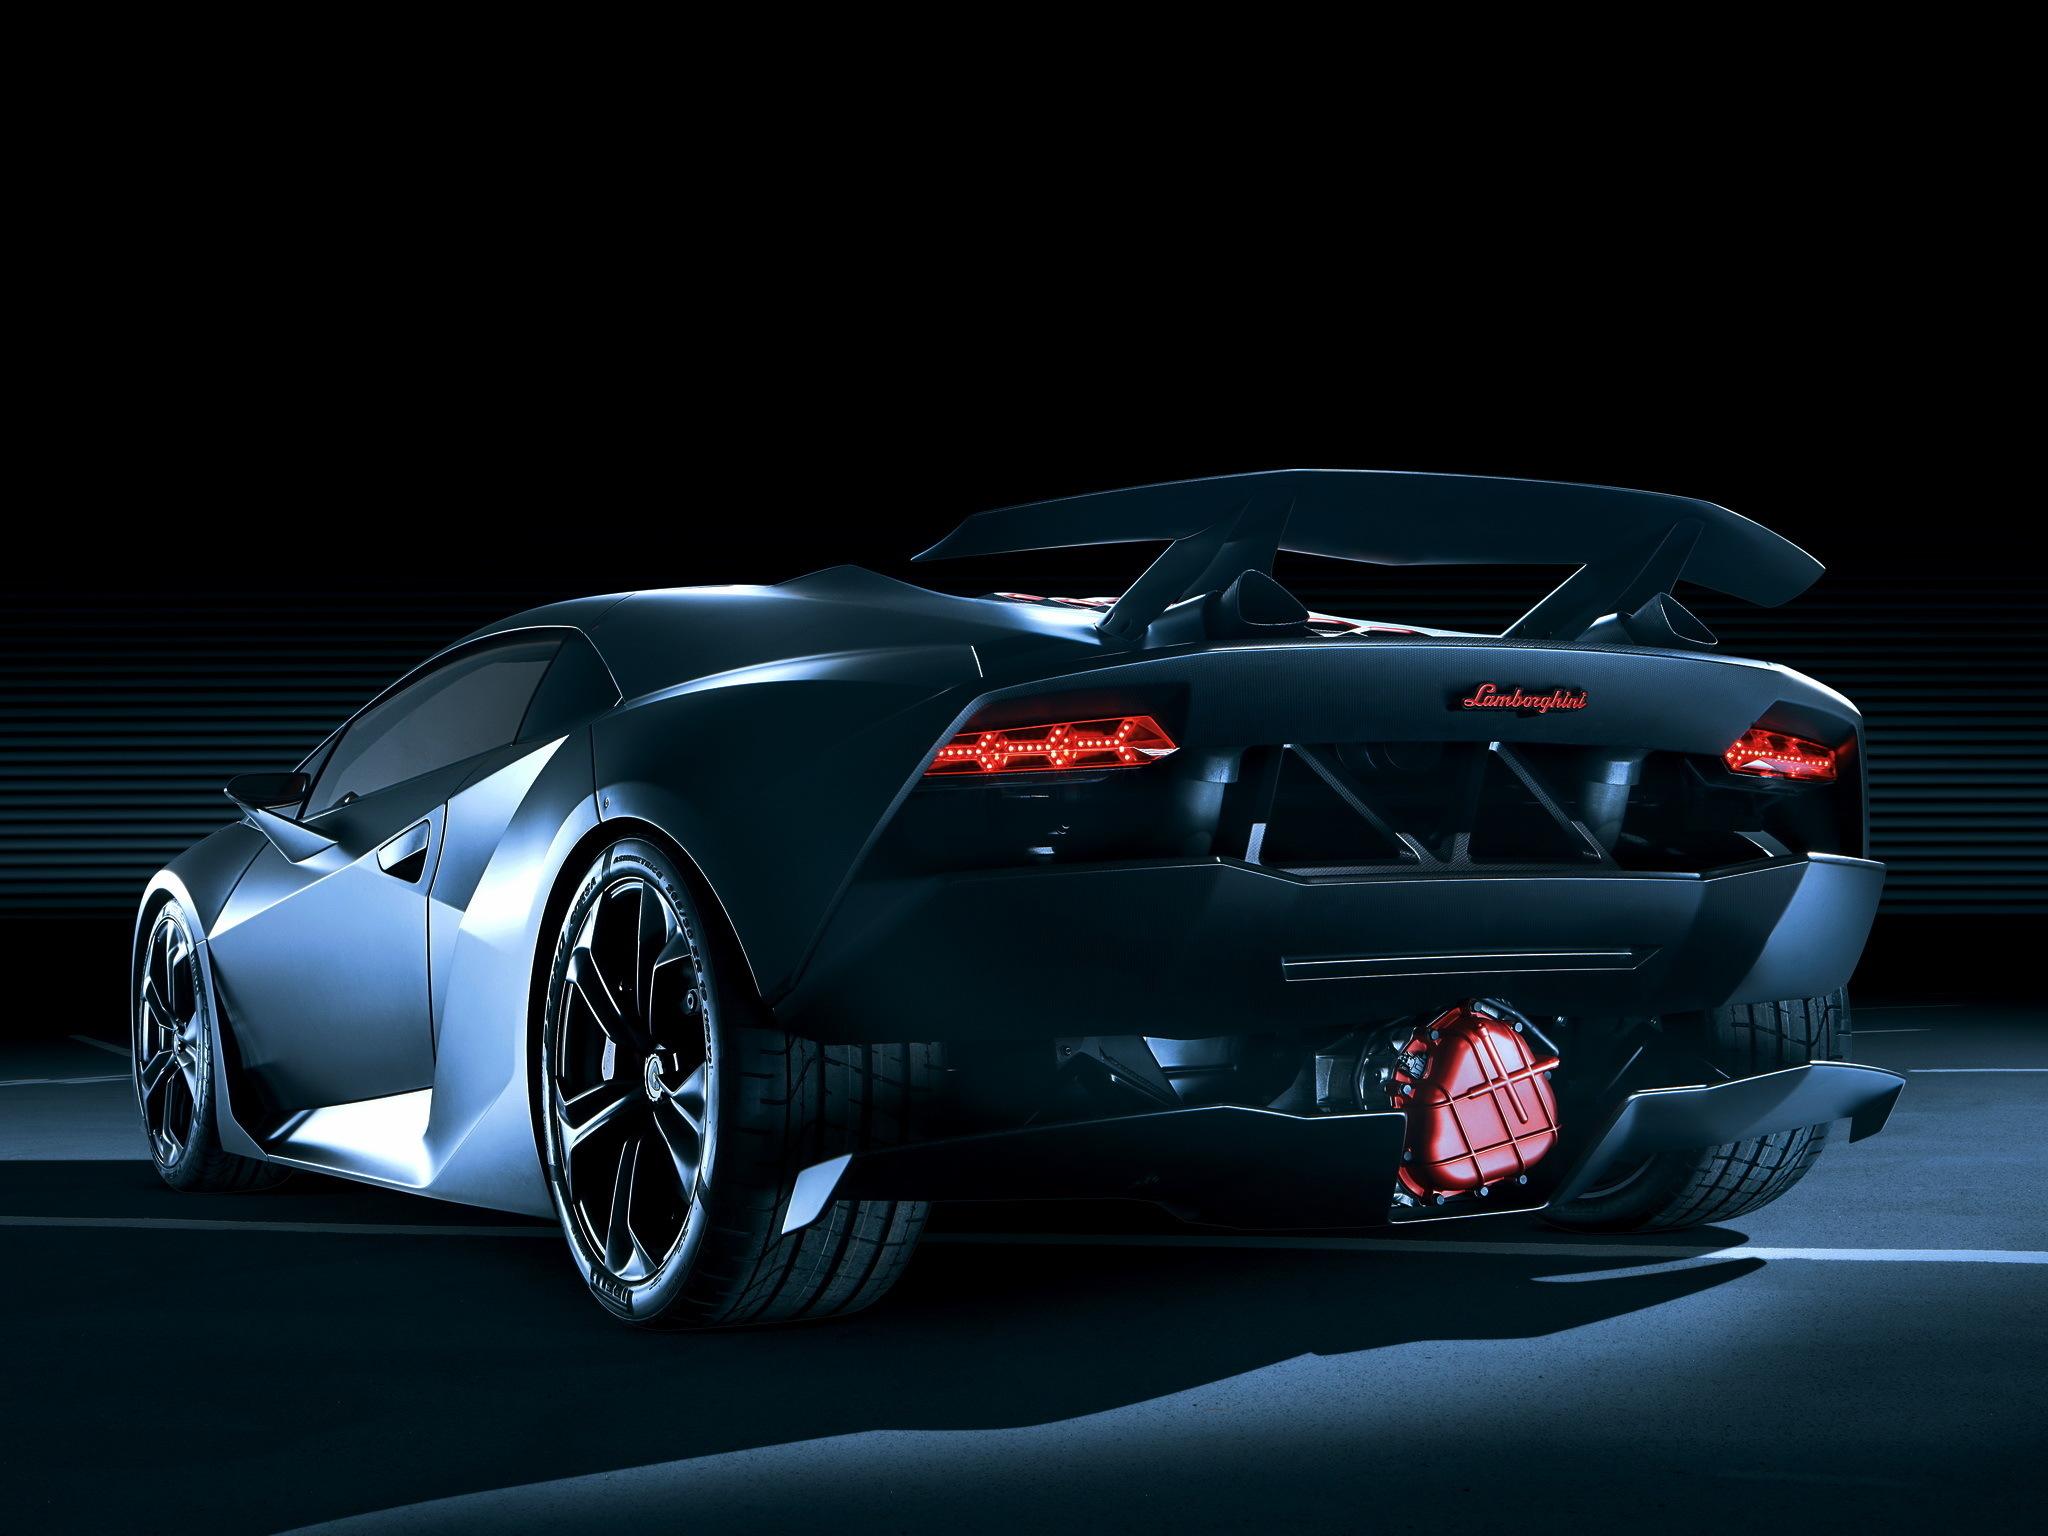 3d Wallpapers Lamborghini Wallpapers: 9 Lamborghini Sesto Elemento HD Wallpapers